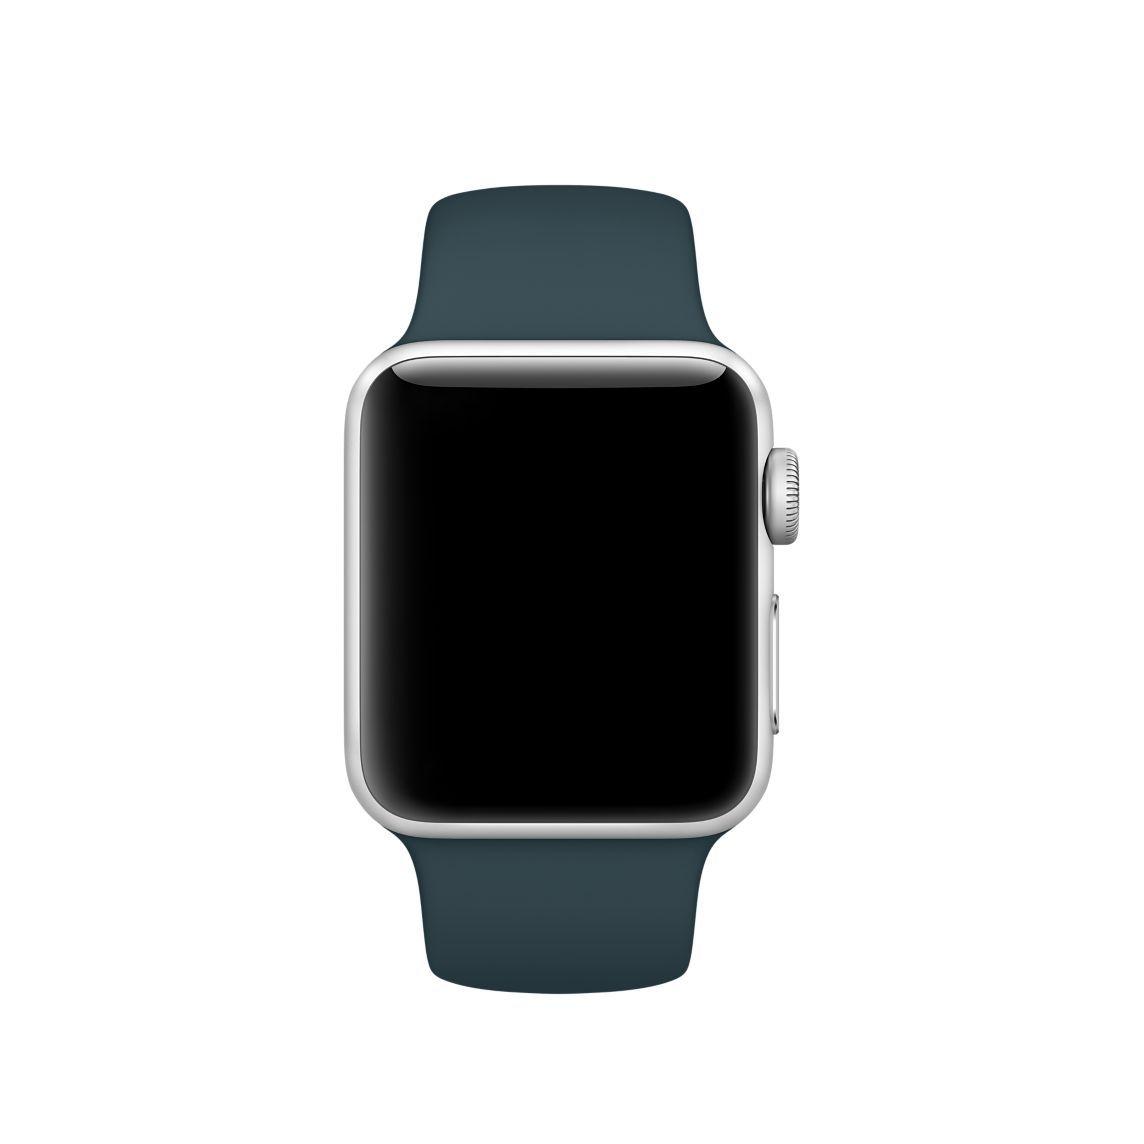 Dark Teal Apple Watch Sport band Apple watch bands